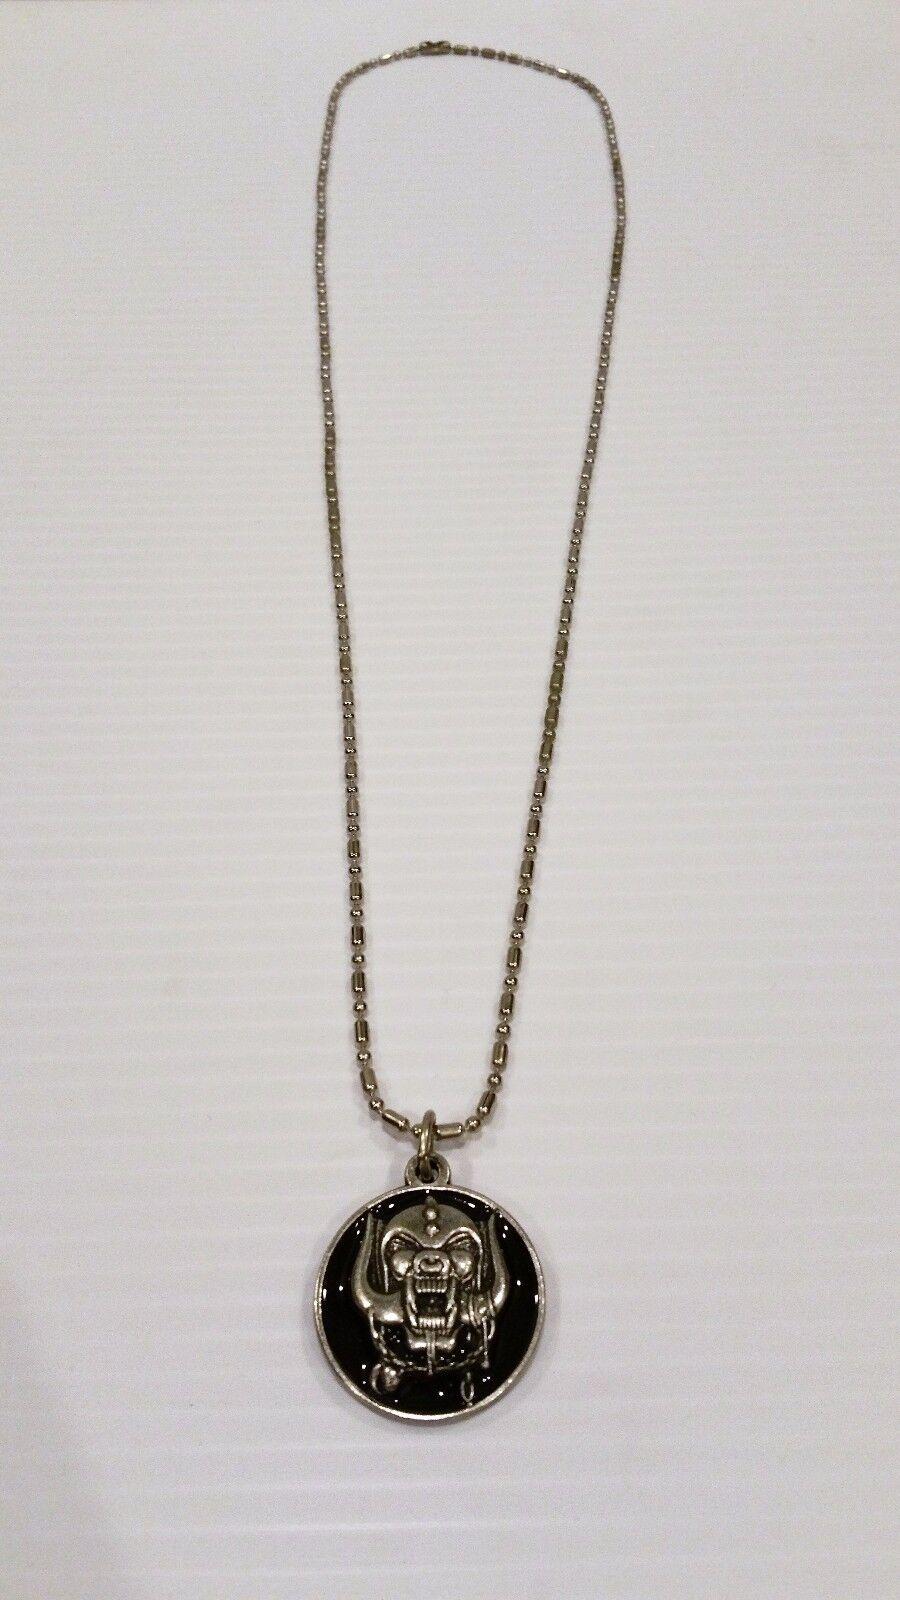 Motorhead warpig pendant with chain